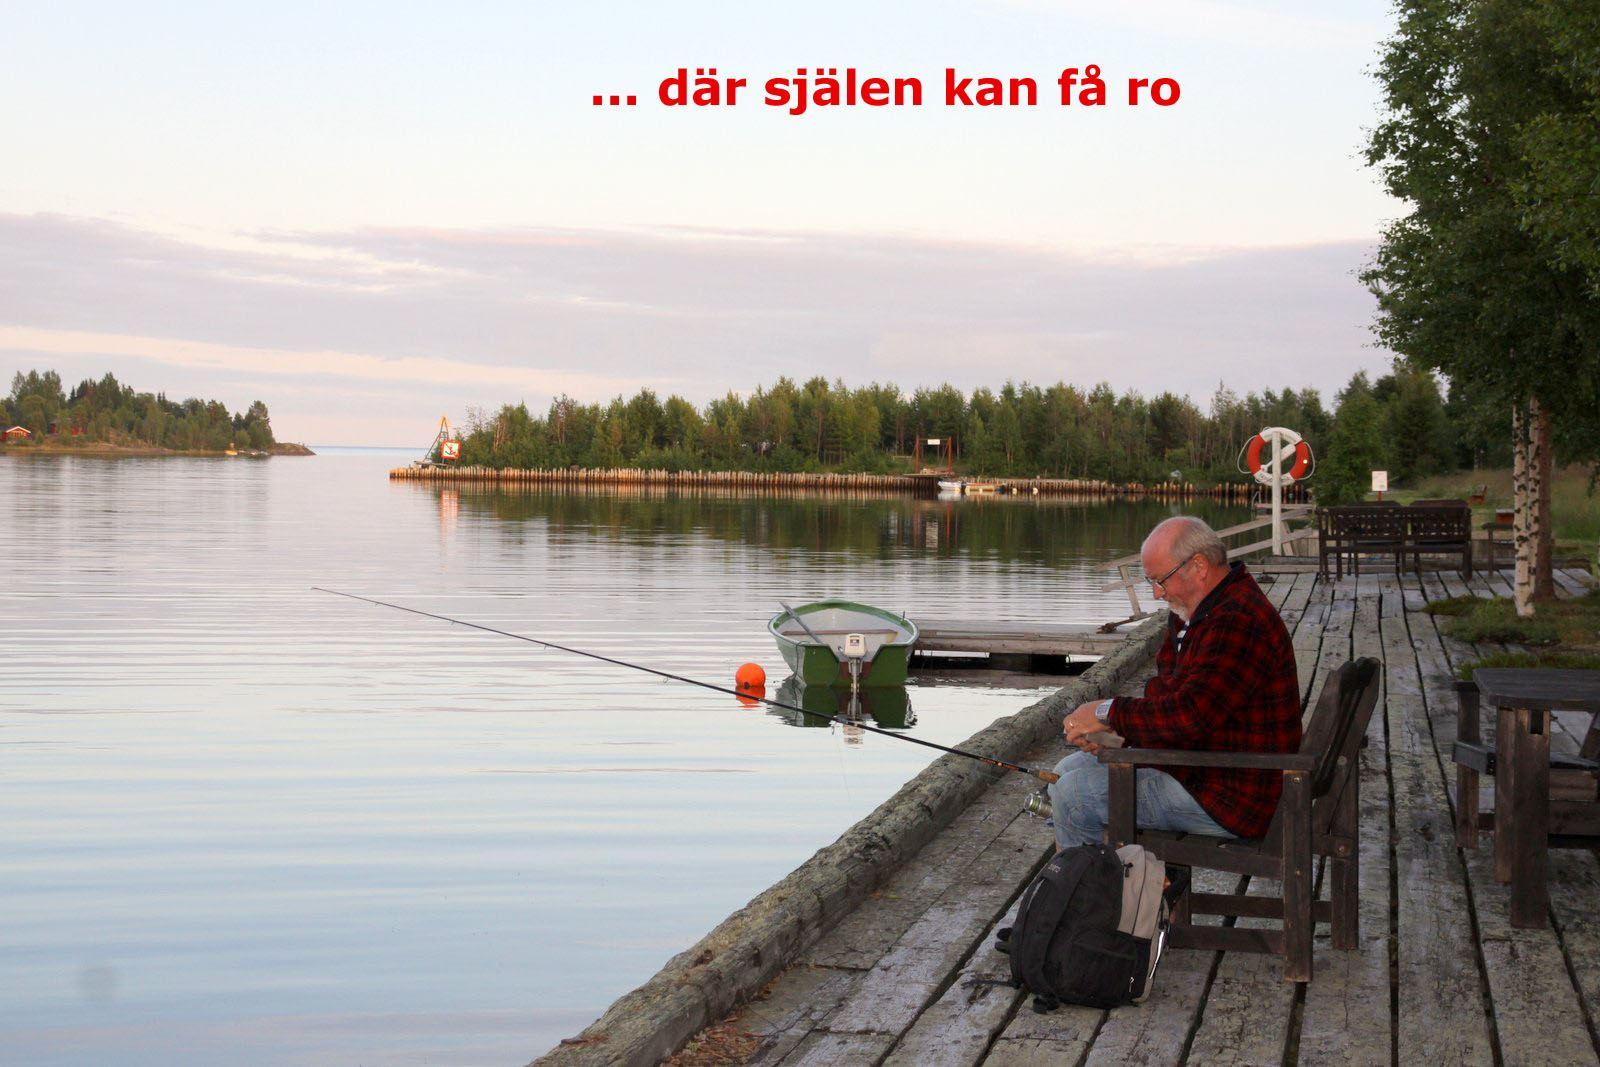 Staffan Stenlund, Avkoppling vid mestspöt